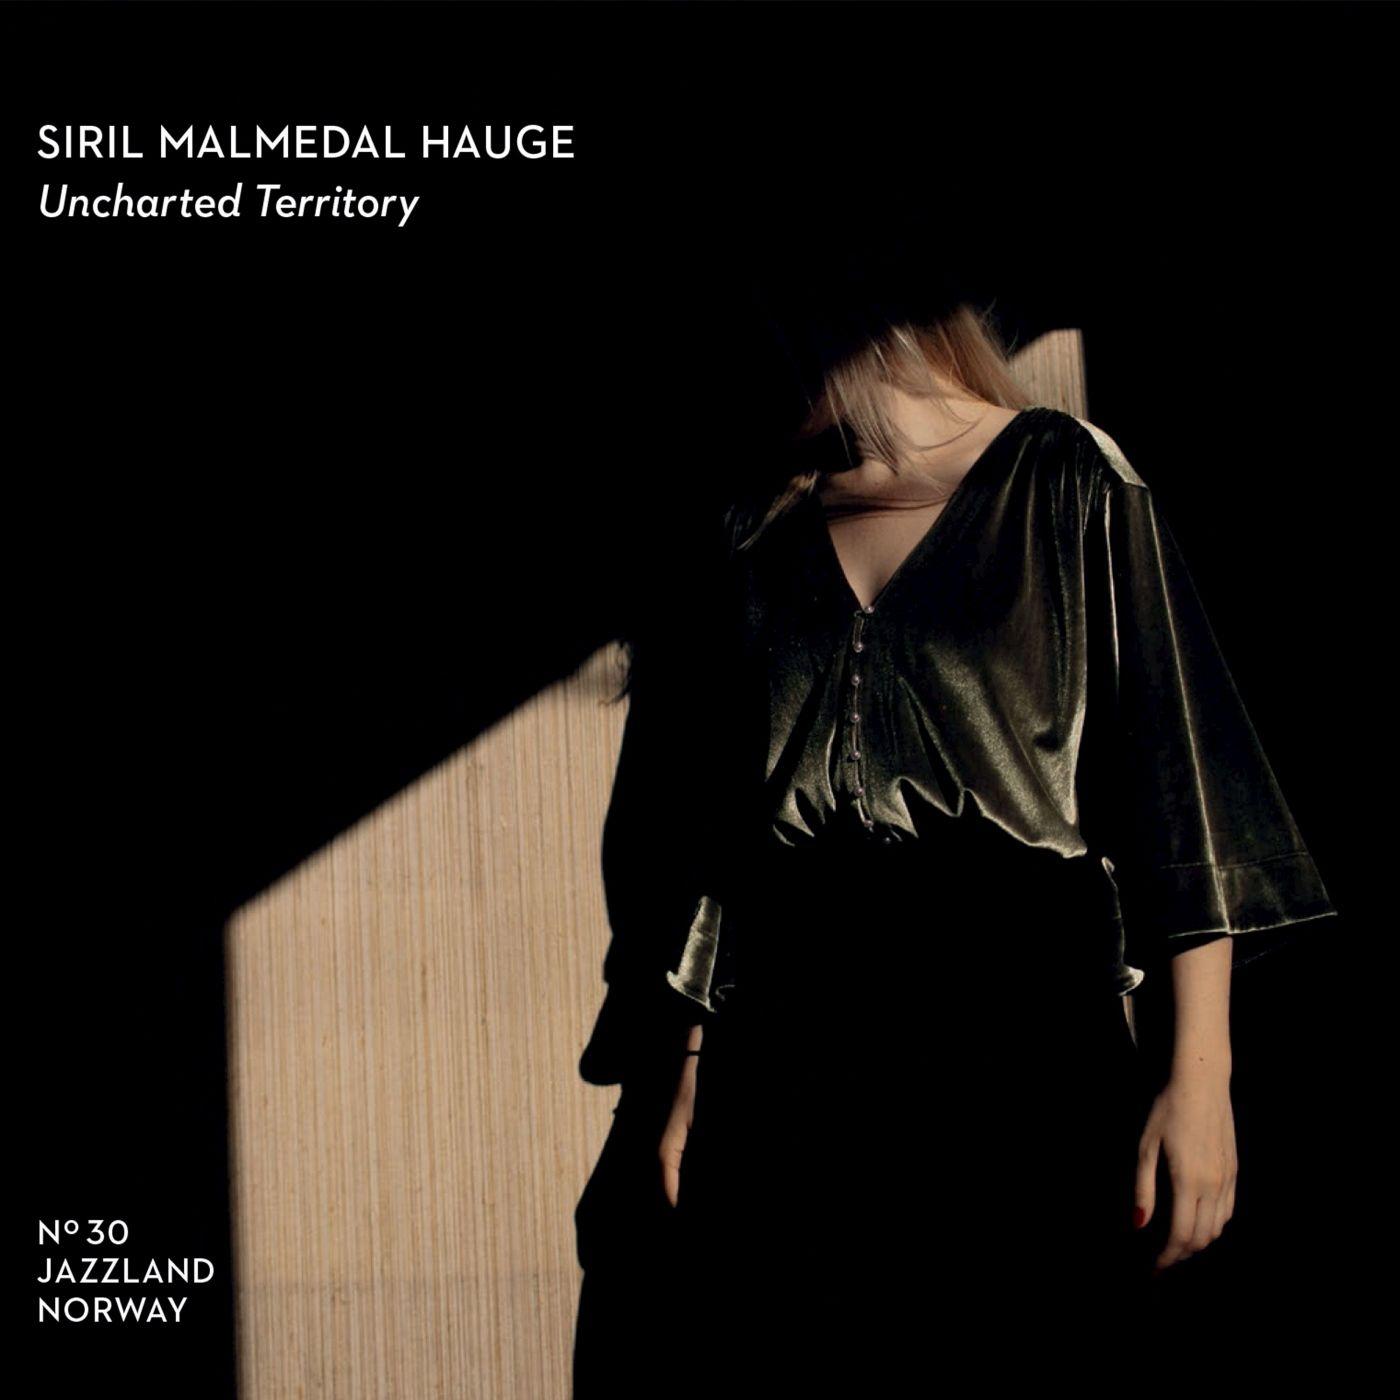 Siril Malmedal Hauge